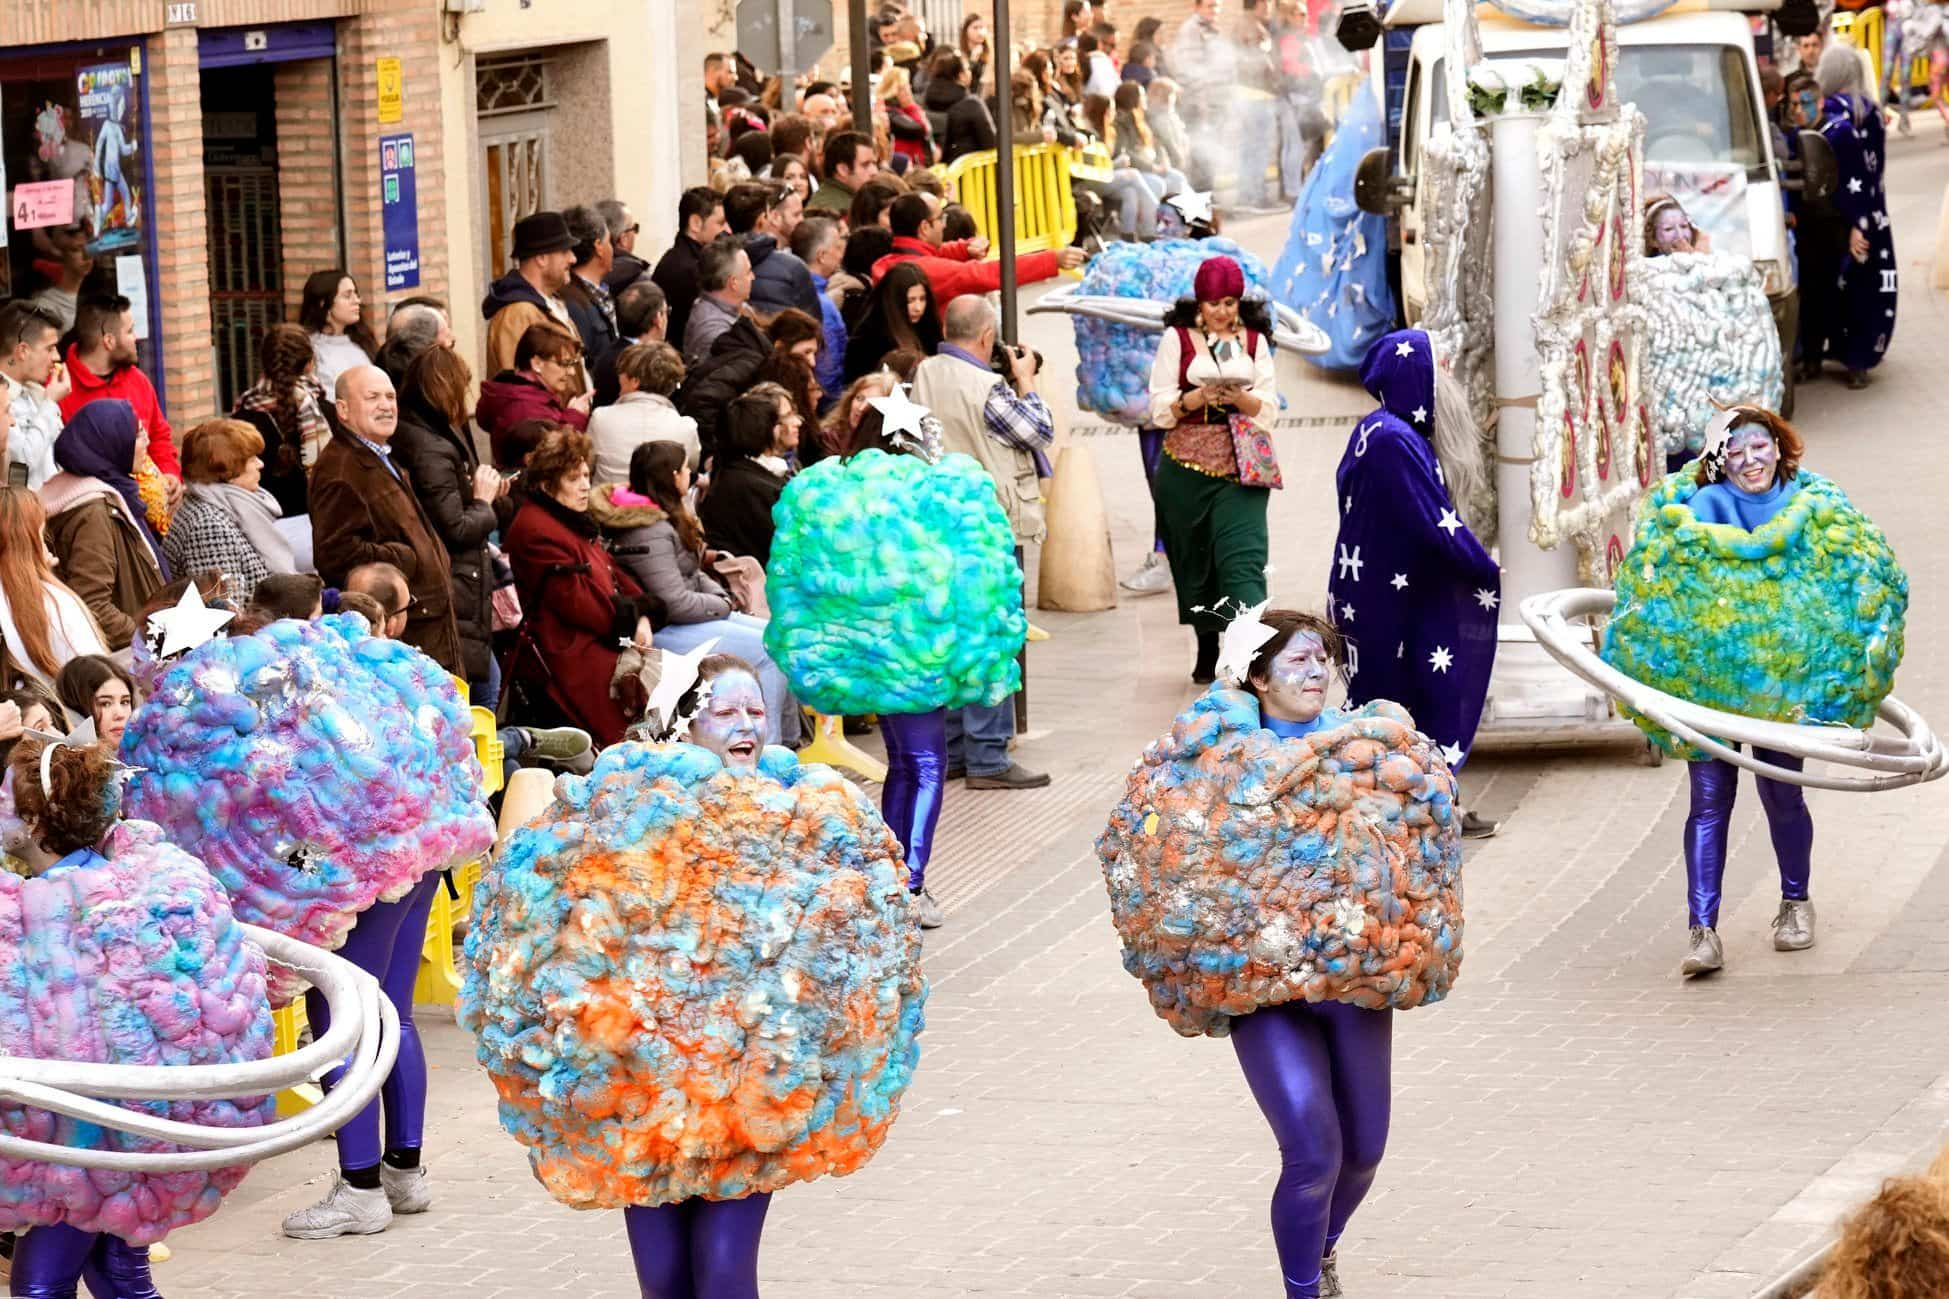 Carnaval de herencia 2020 ofertorio 91 - Selección de fotografías del Ofertorio del Carnaval de Herencia